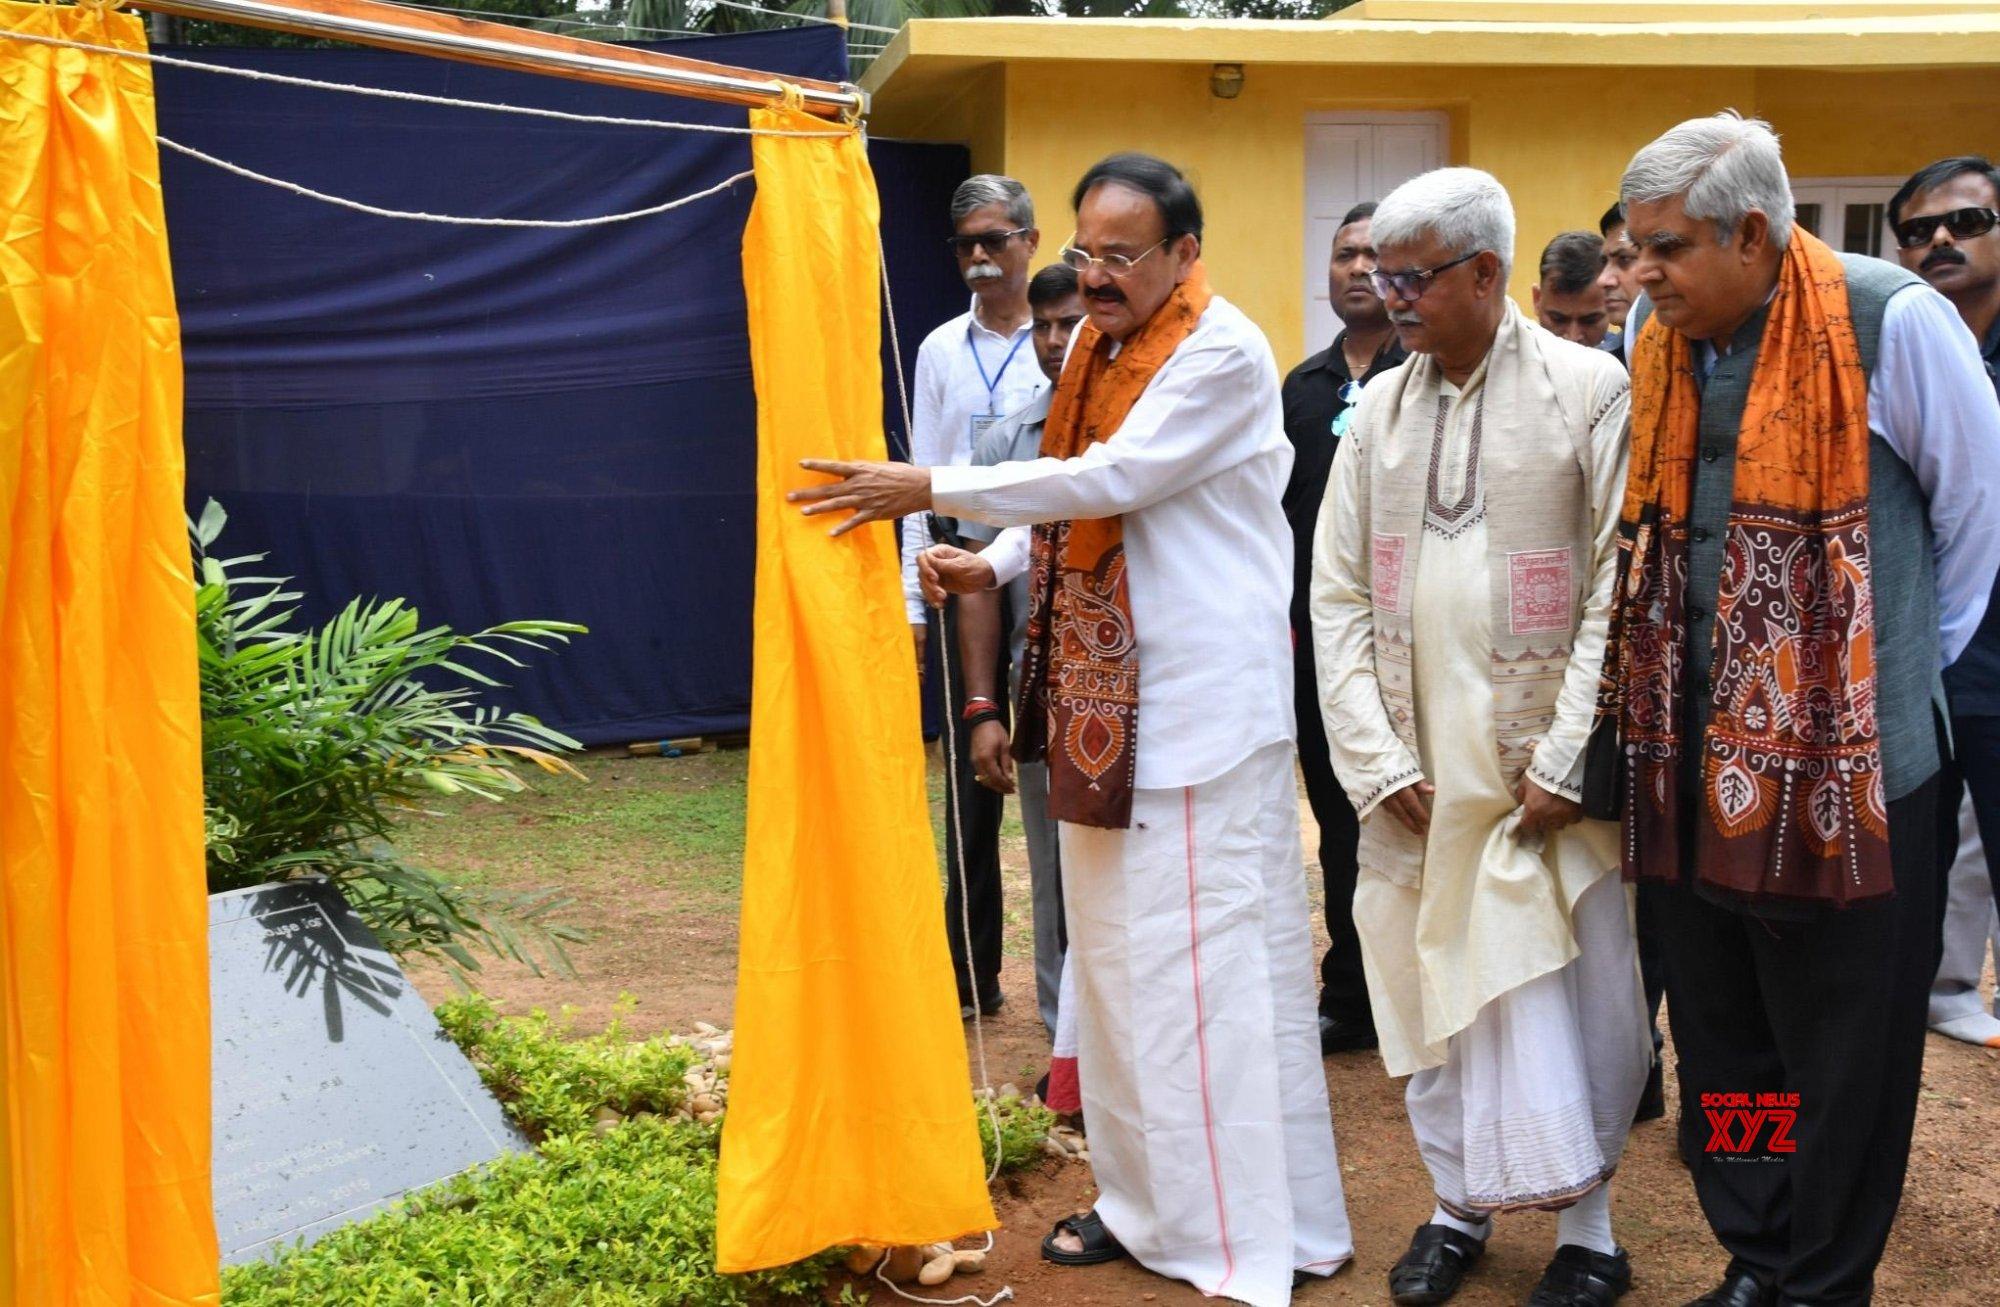 Santiniketan: Venkaiah Naidu inaugurates 'Shyamoli' - the heritage house of Rabindranath Tagore #Gallery